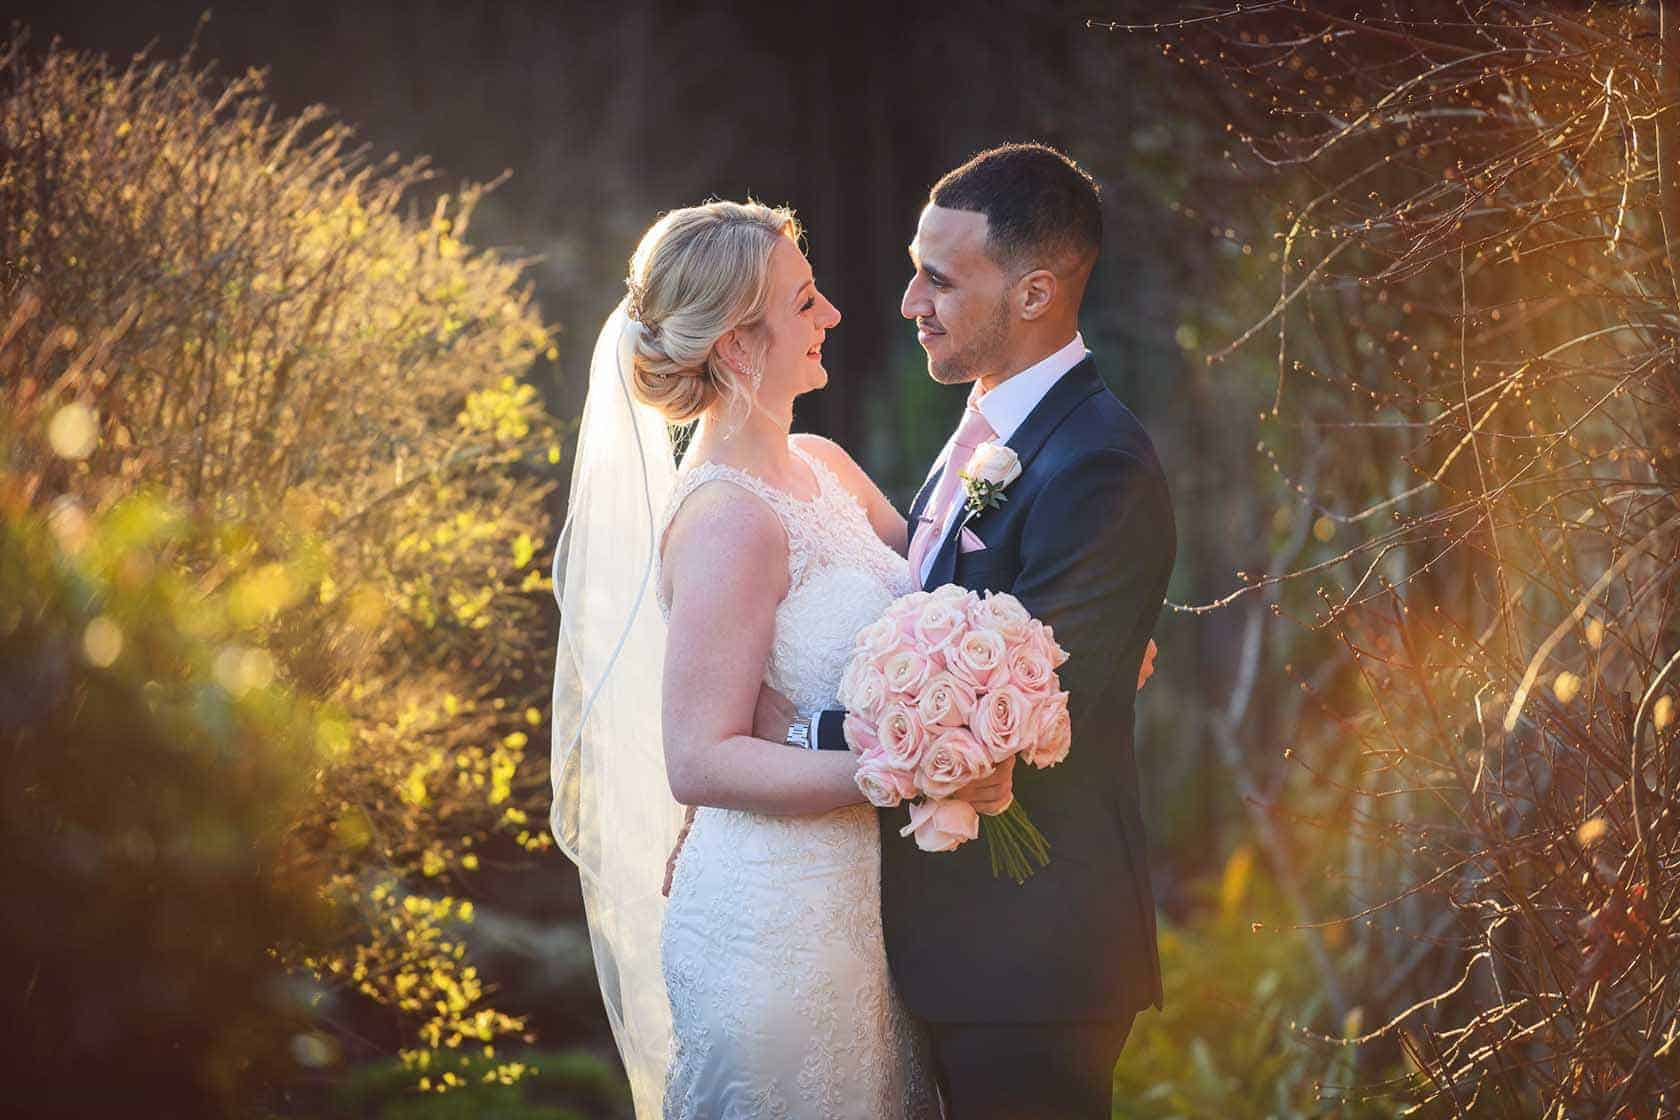 Gaynes-Park-February-Wedding-Photographer-Essex-Justin-Bailey-12